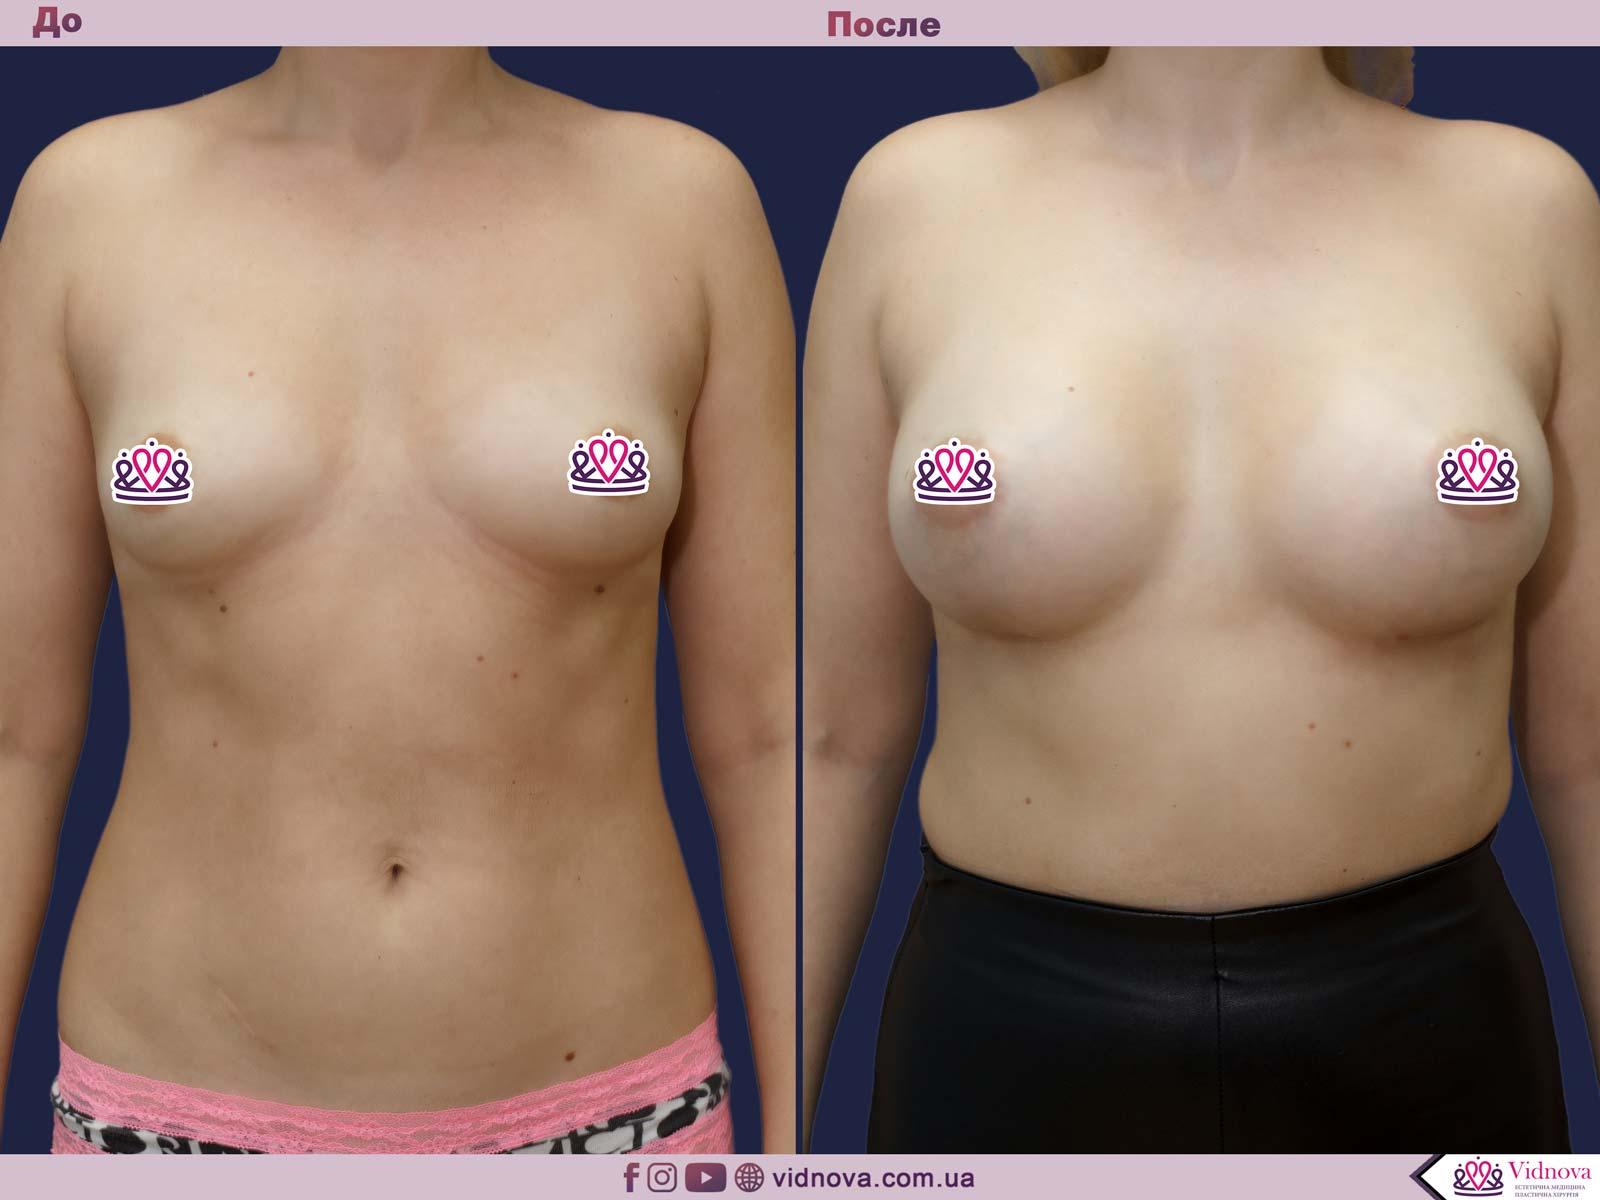 Увеличение груди: Фото ДО и ПОСЛЕ - Пример №71-1 - Клиника Vidnova